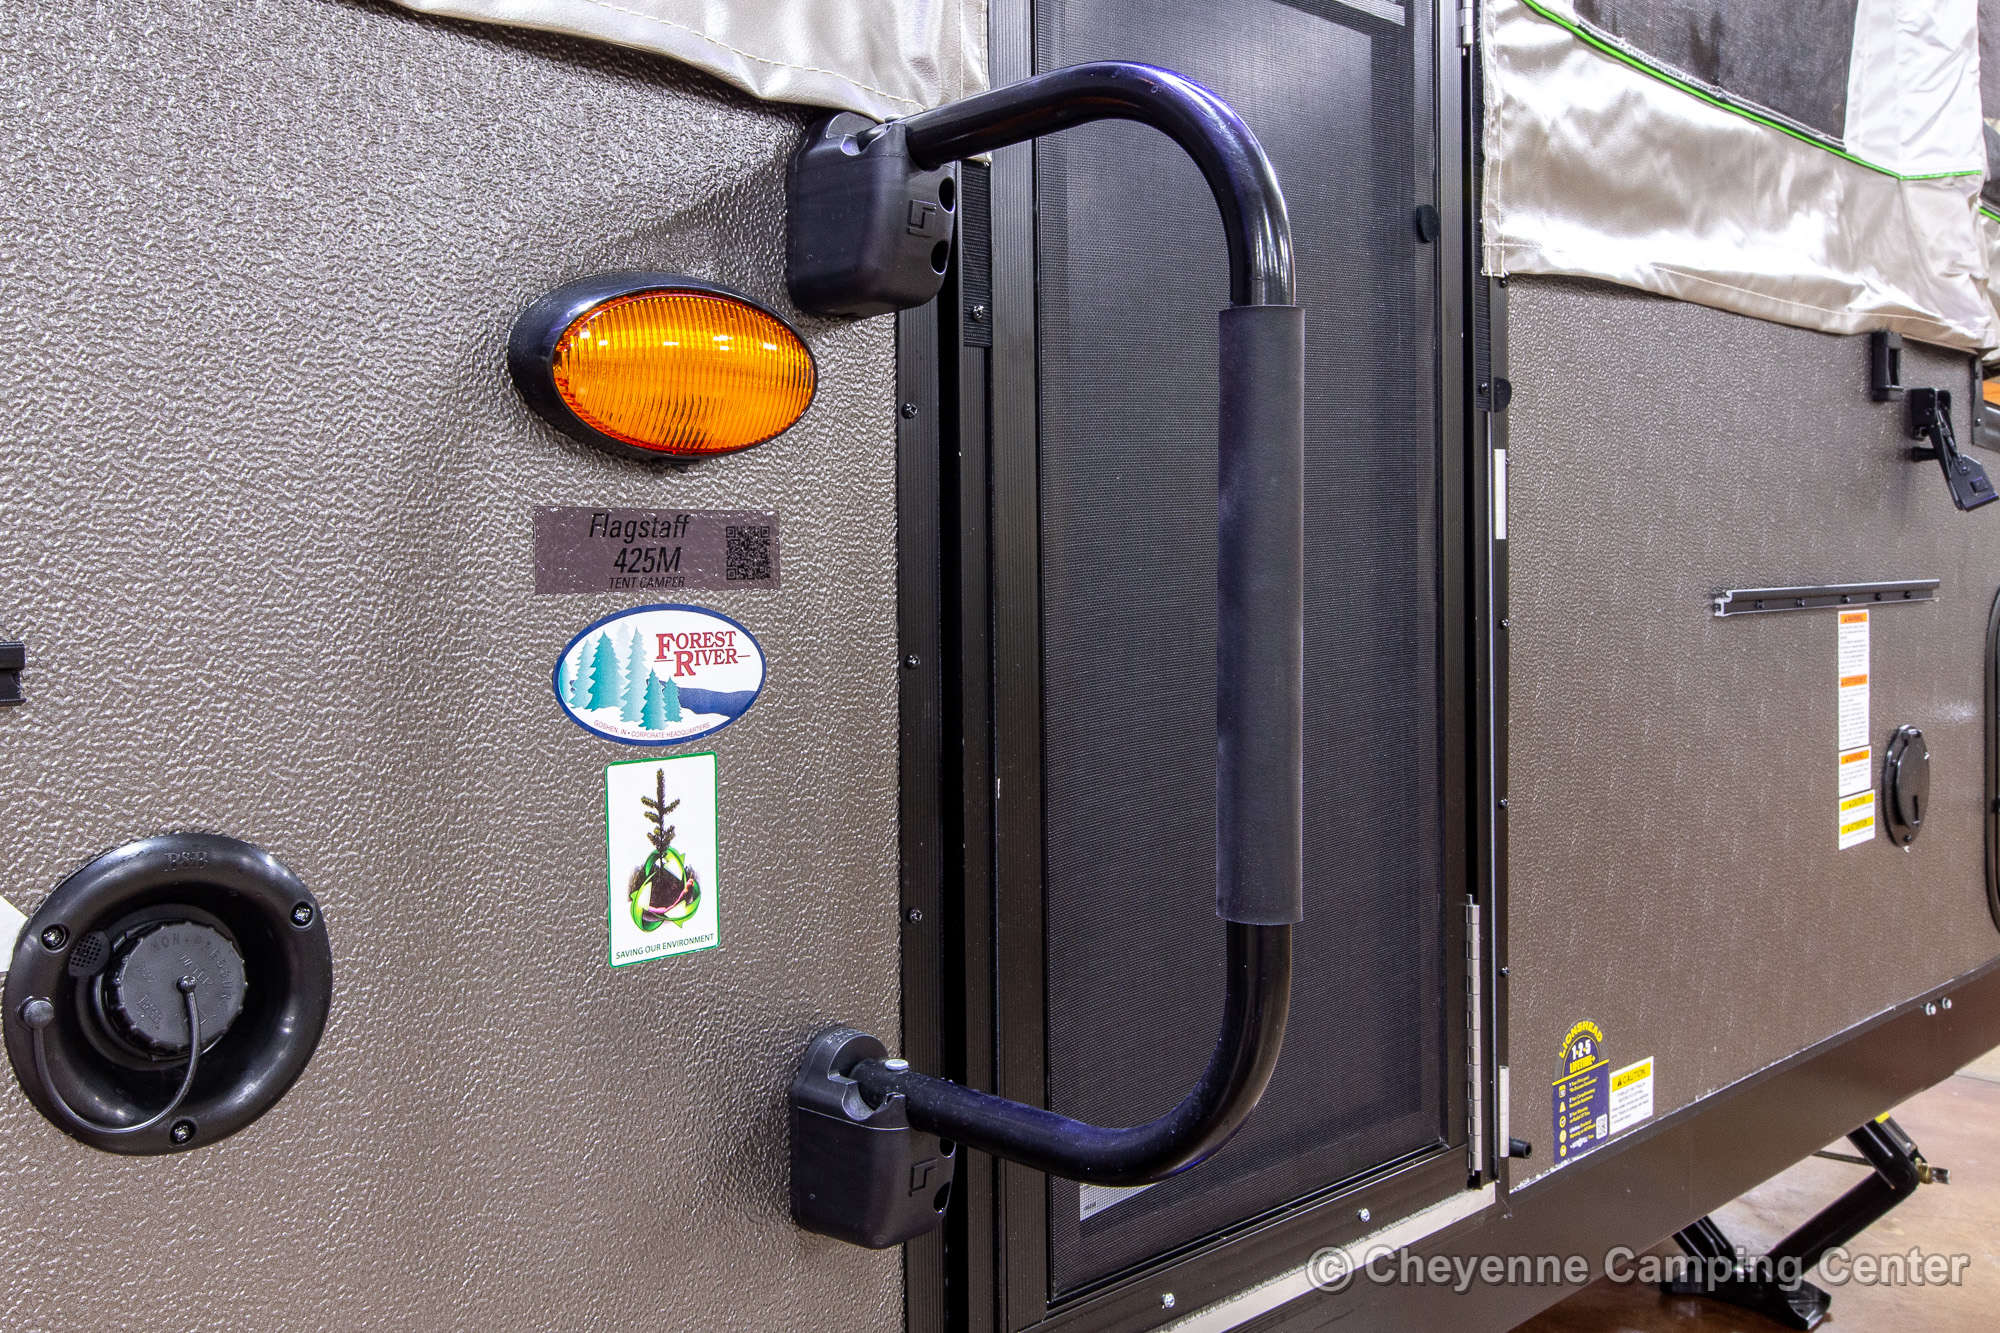 2022 Forest River Flagstaff MAC 425M Folding Camper Exterior Image